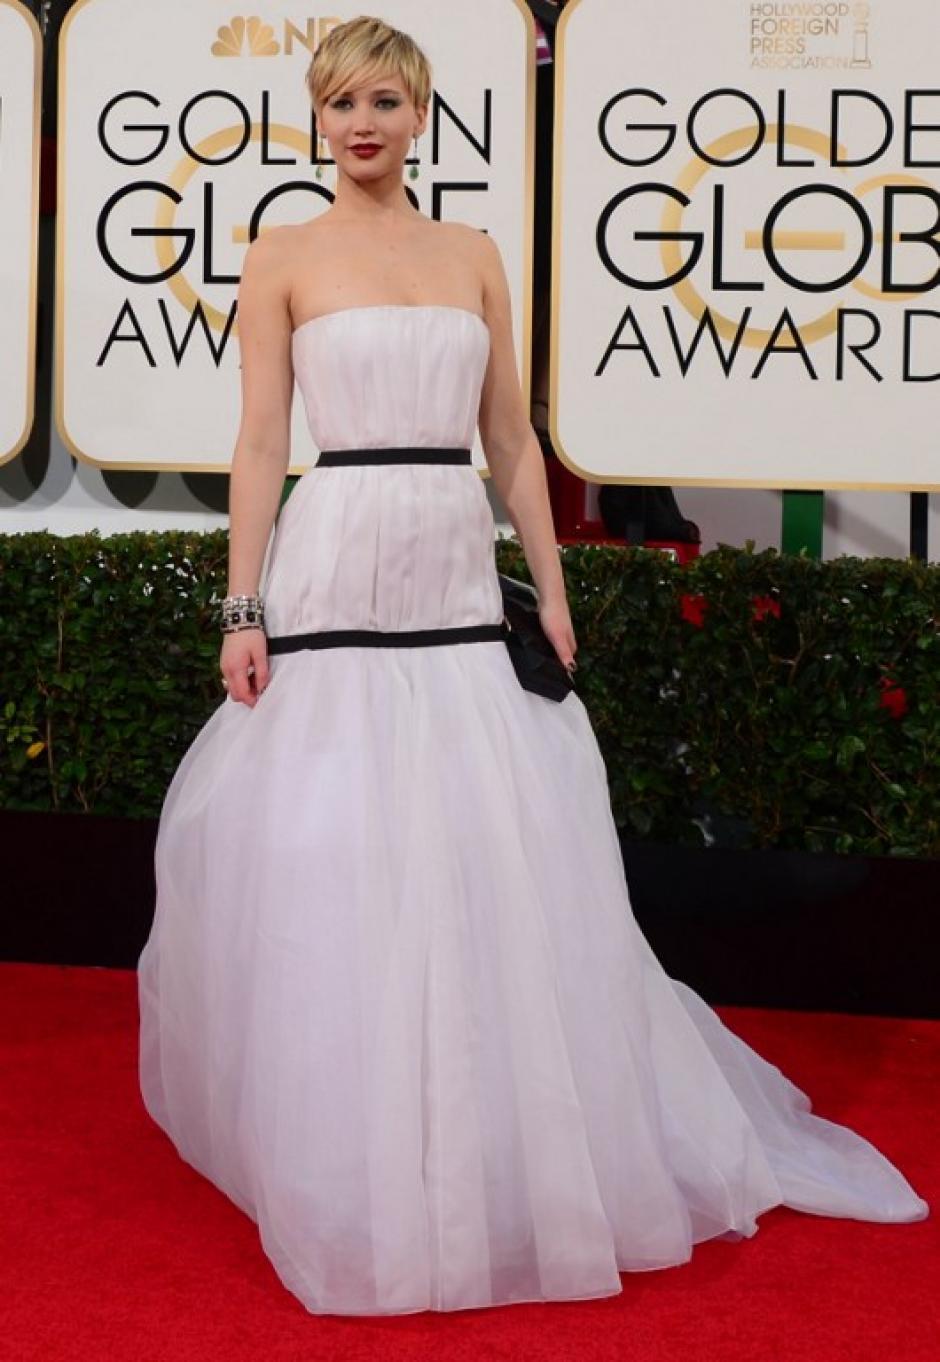 La actriz Jennifer Lawrence. (Foto: AFP)